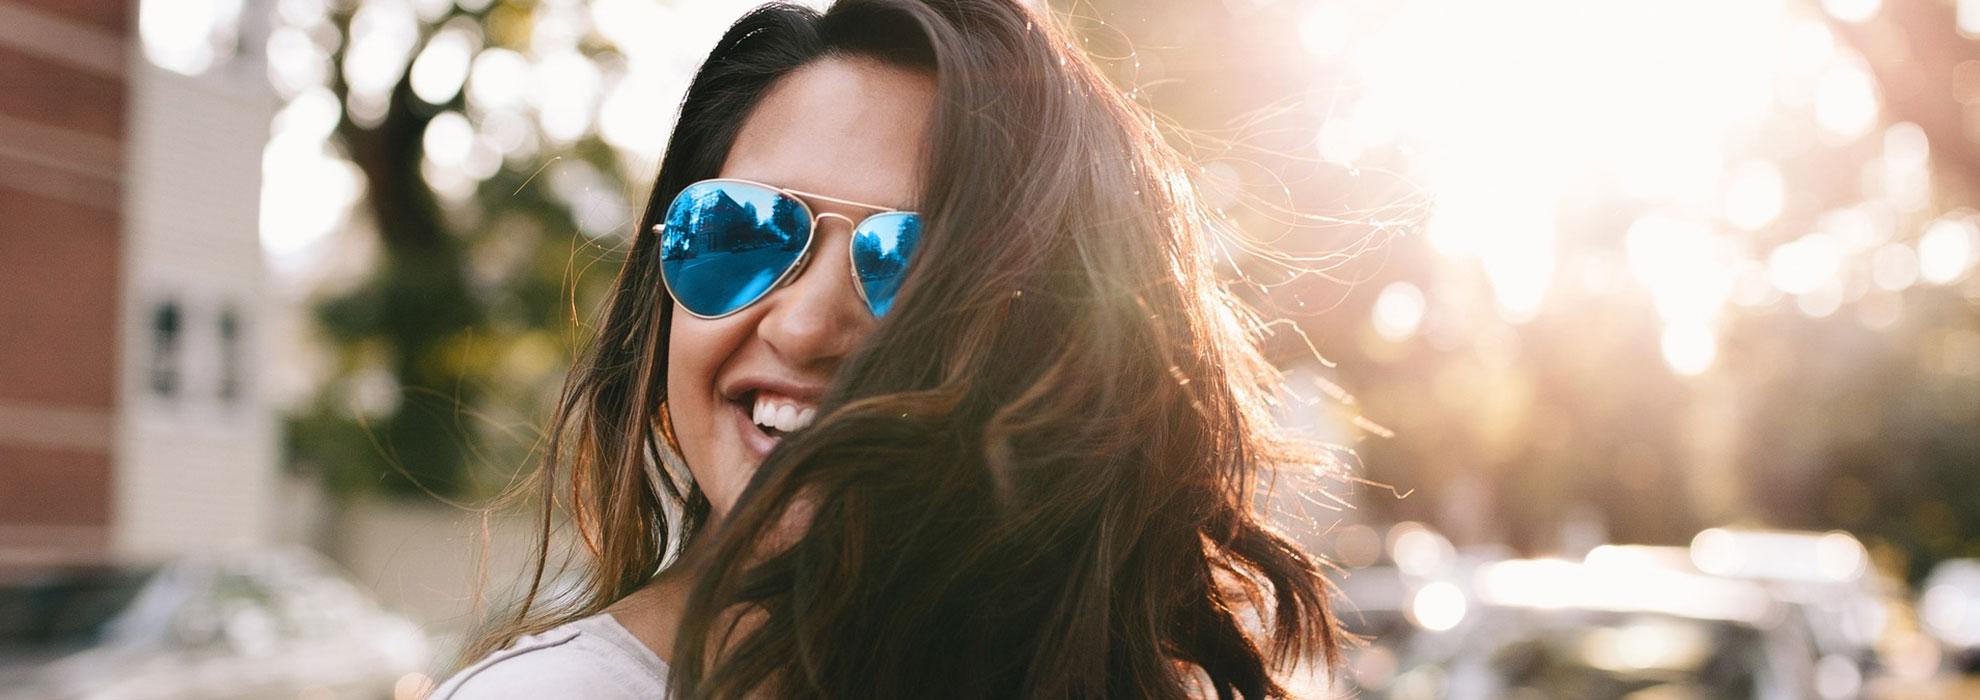 Startseite-sunglasses-2599017_1920